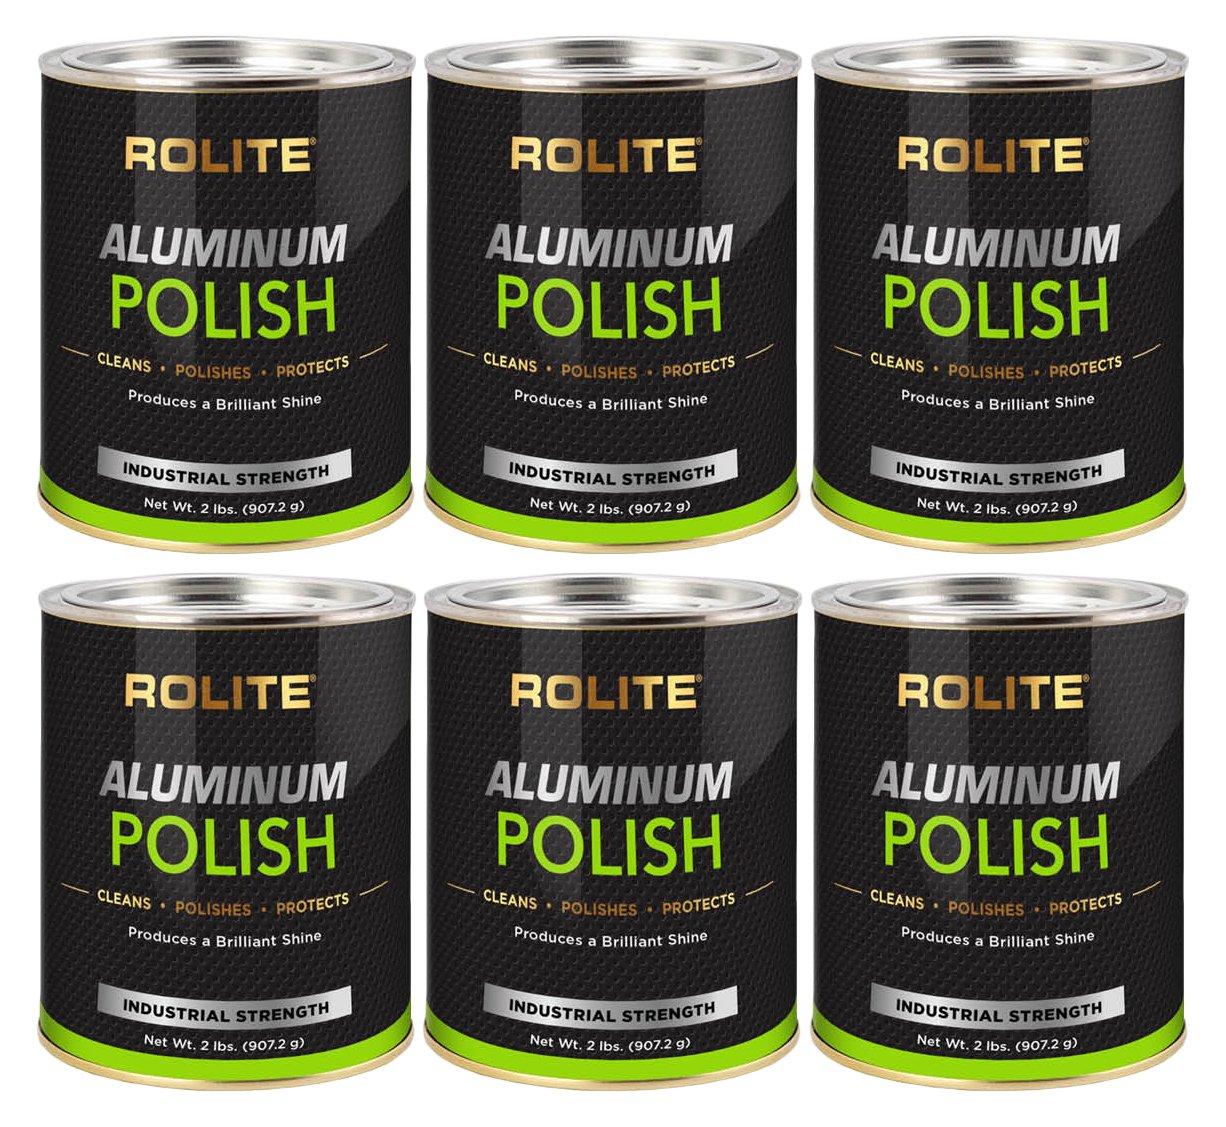 Rolite Aluminum Polish (2lb) for All Aluminum & Bare Metal Surfaces, Canoes, Jon Boats, Pontoons, Diamond Plate, Aluminum Non-Coated Wheels 6 Pack